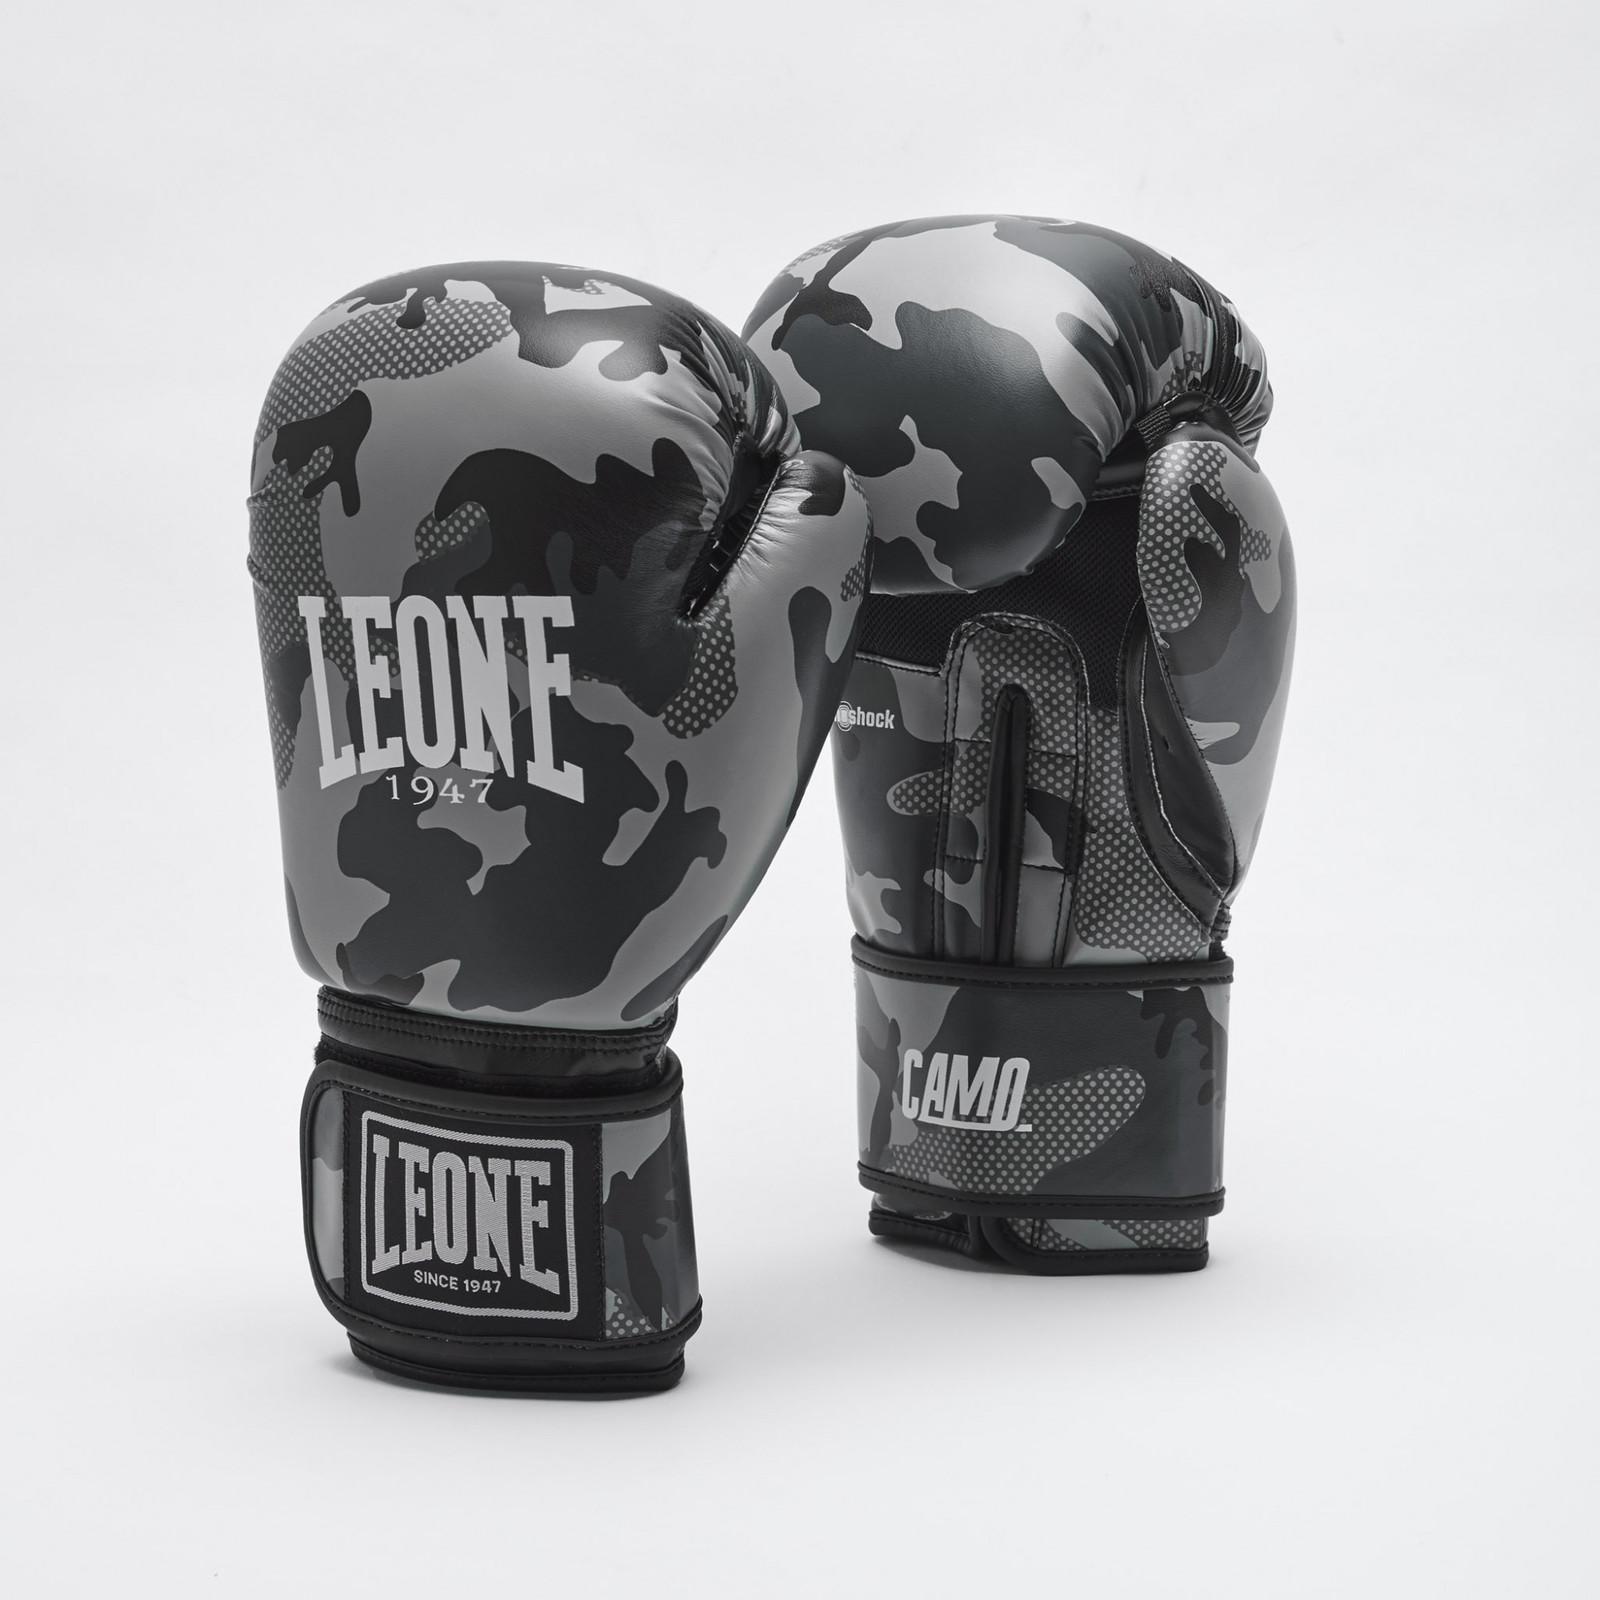 Leone 1947 Boxhandschuhe Camo